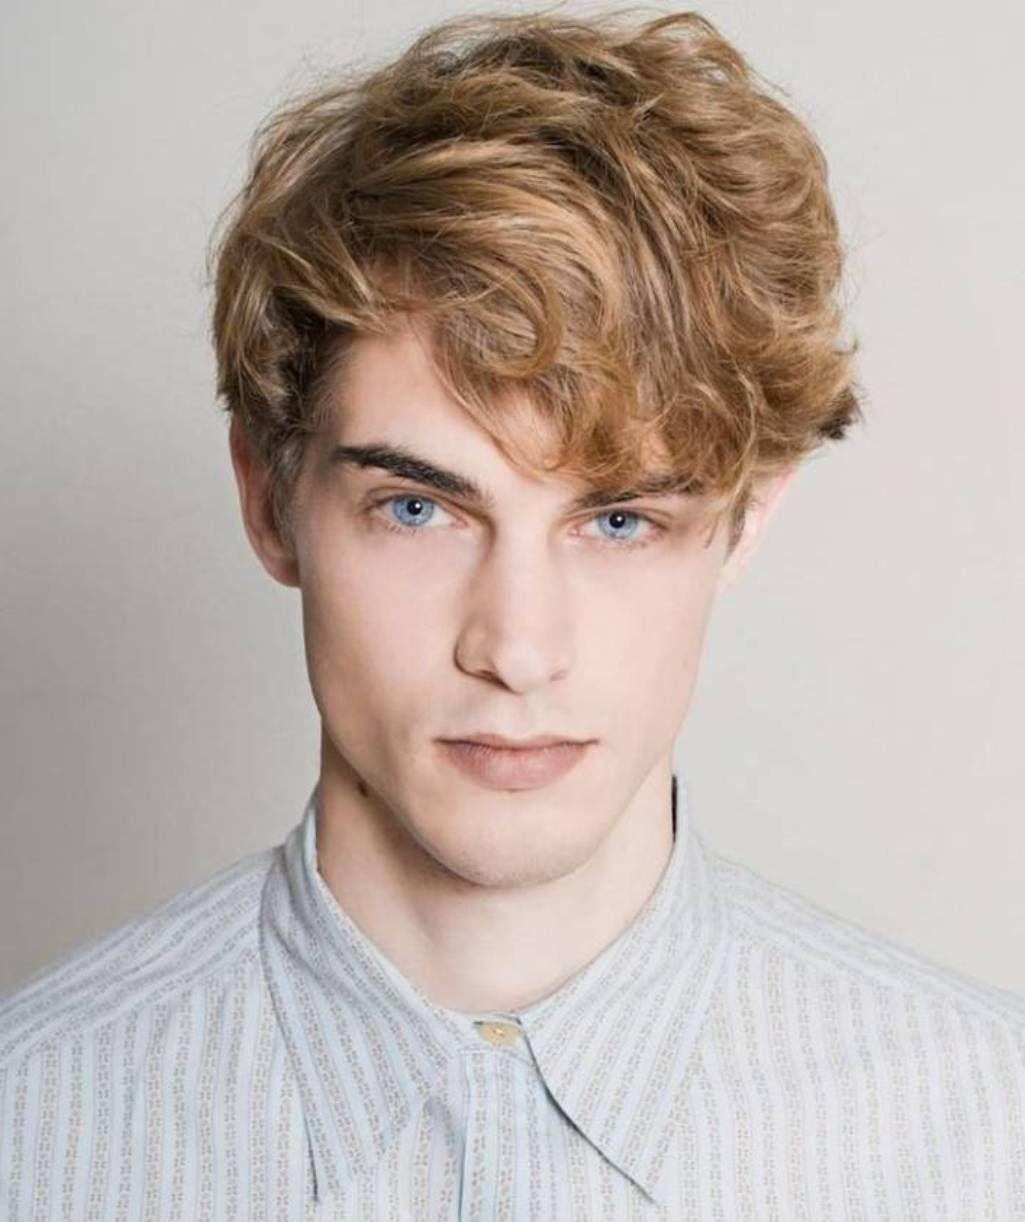 short curly hairstyle men mens hair on pinterest men hair men